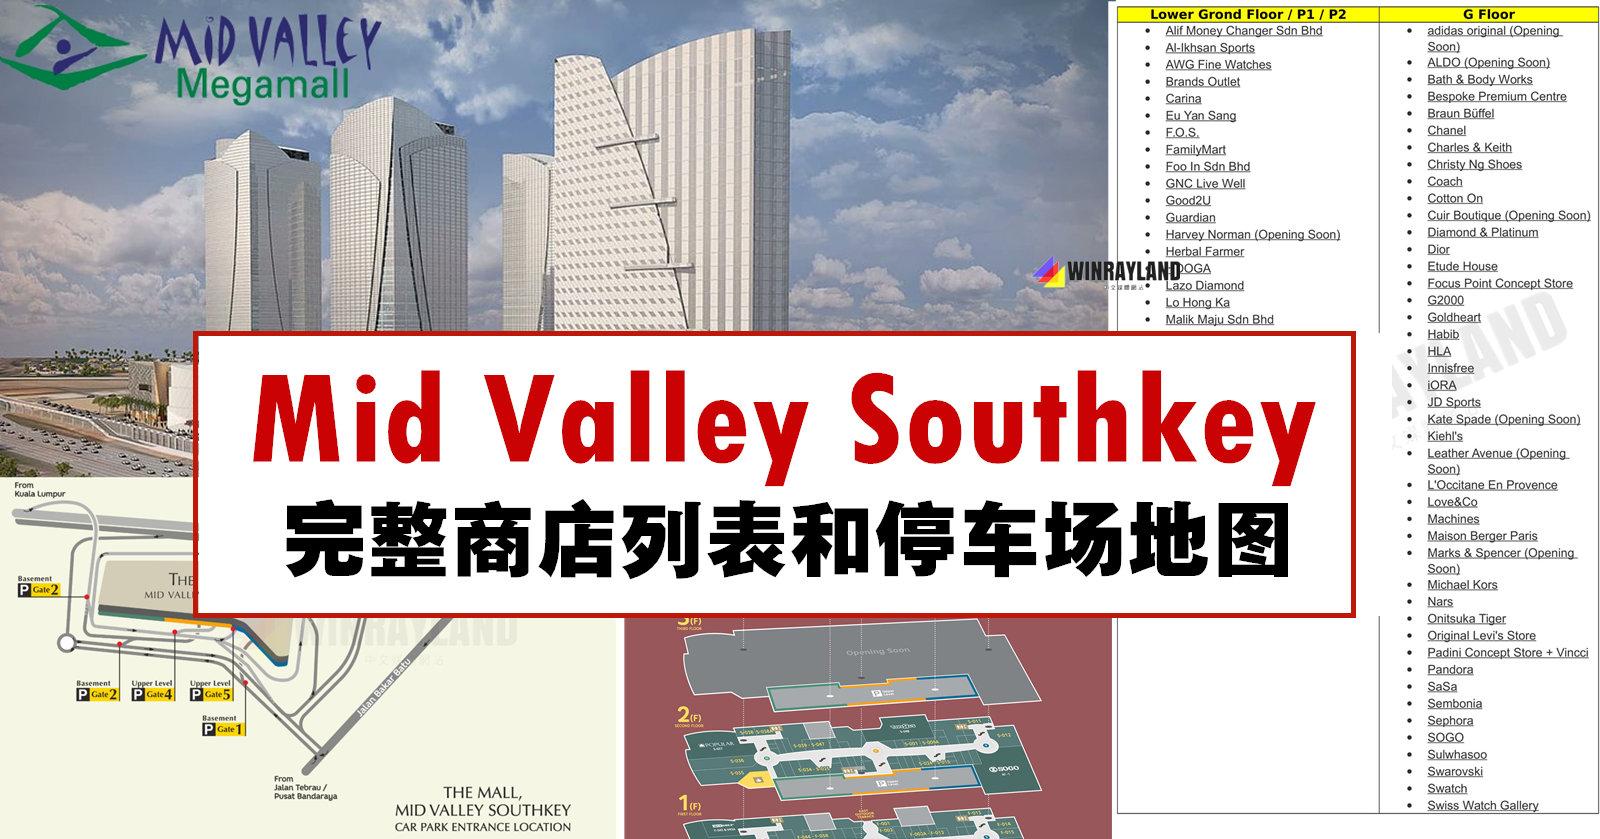 Mid Valley Southkey 4月23日开张,附上完整商店列表